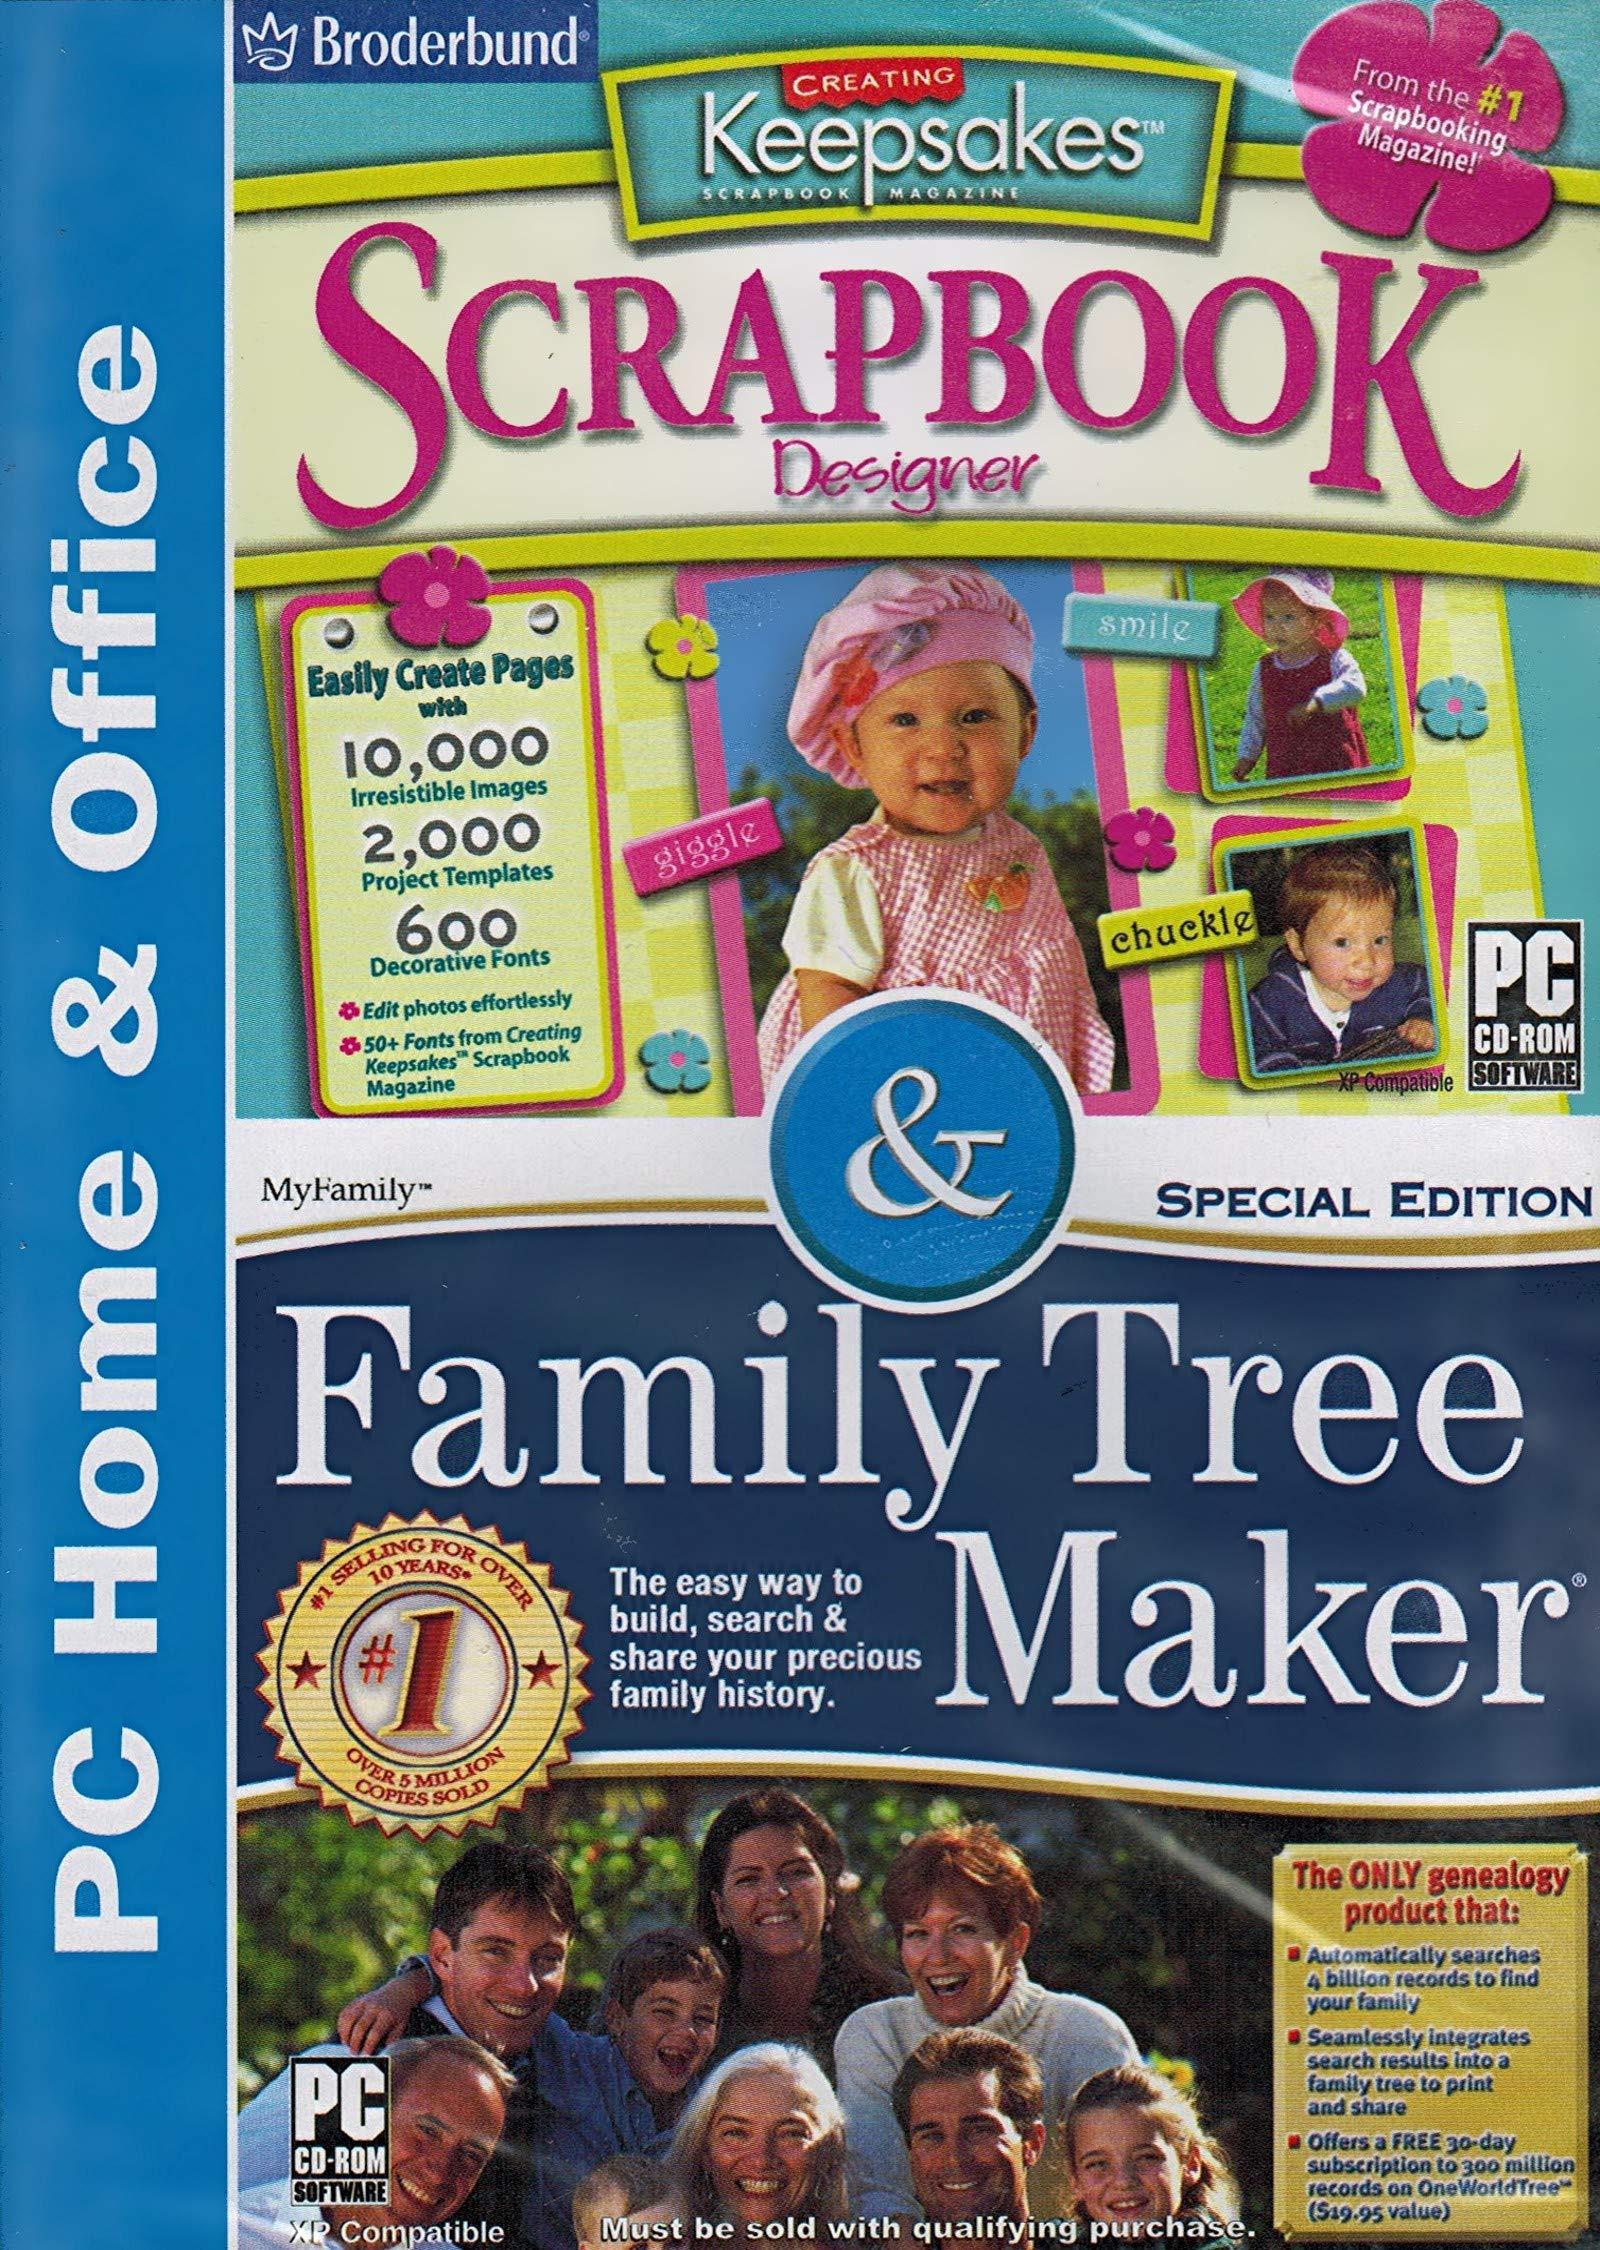 Scrapbook Designer & Family Tree Maker By Broderbund by Creating Keepsakes Scrapbook